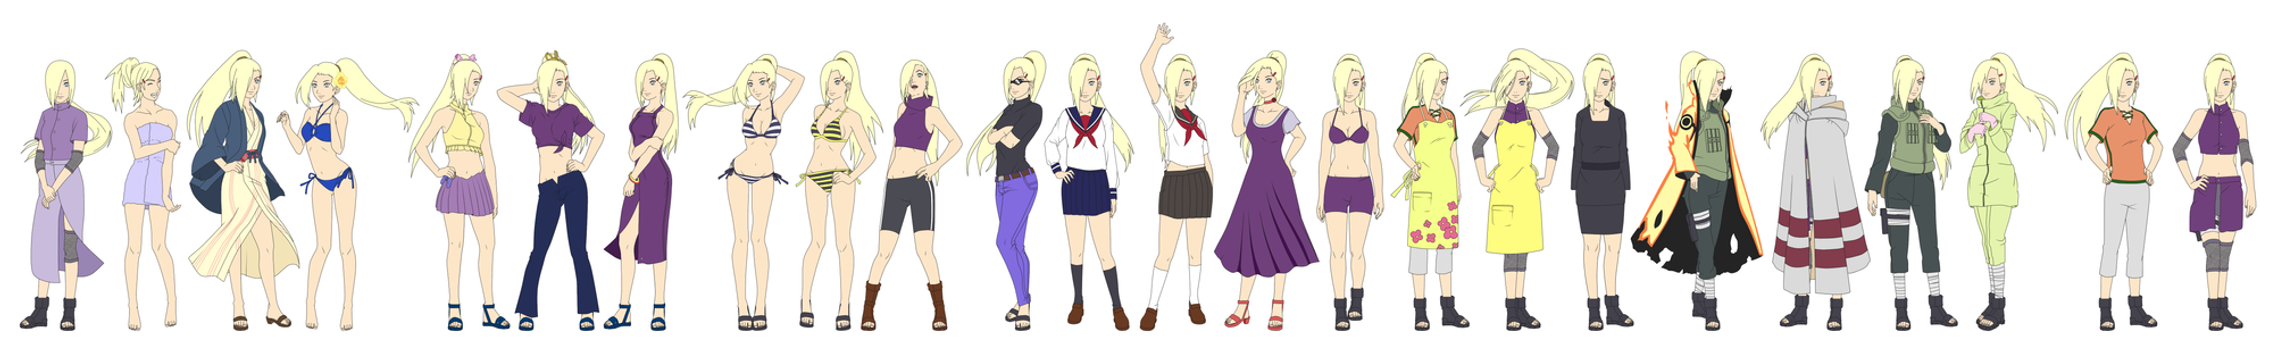 Ino Yamanaka Outfit Color NARUTO SHIPPUUDEN by ...